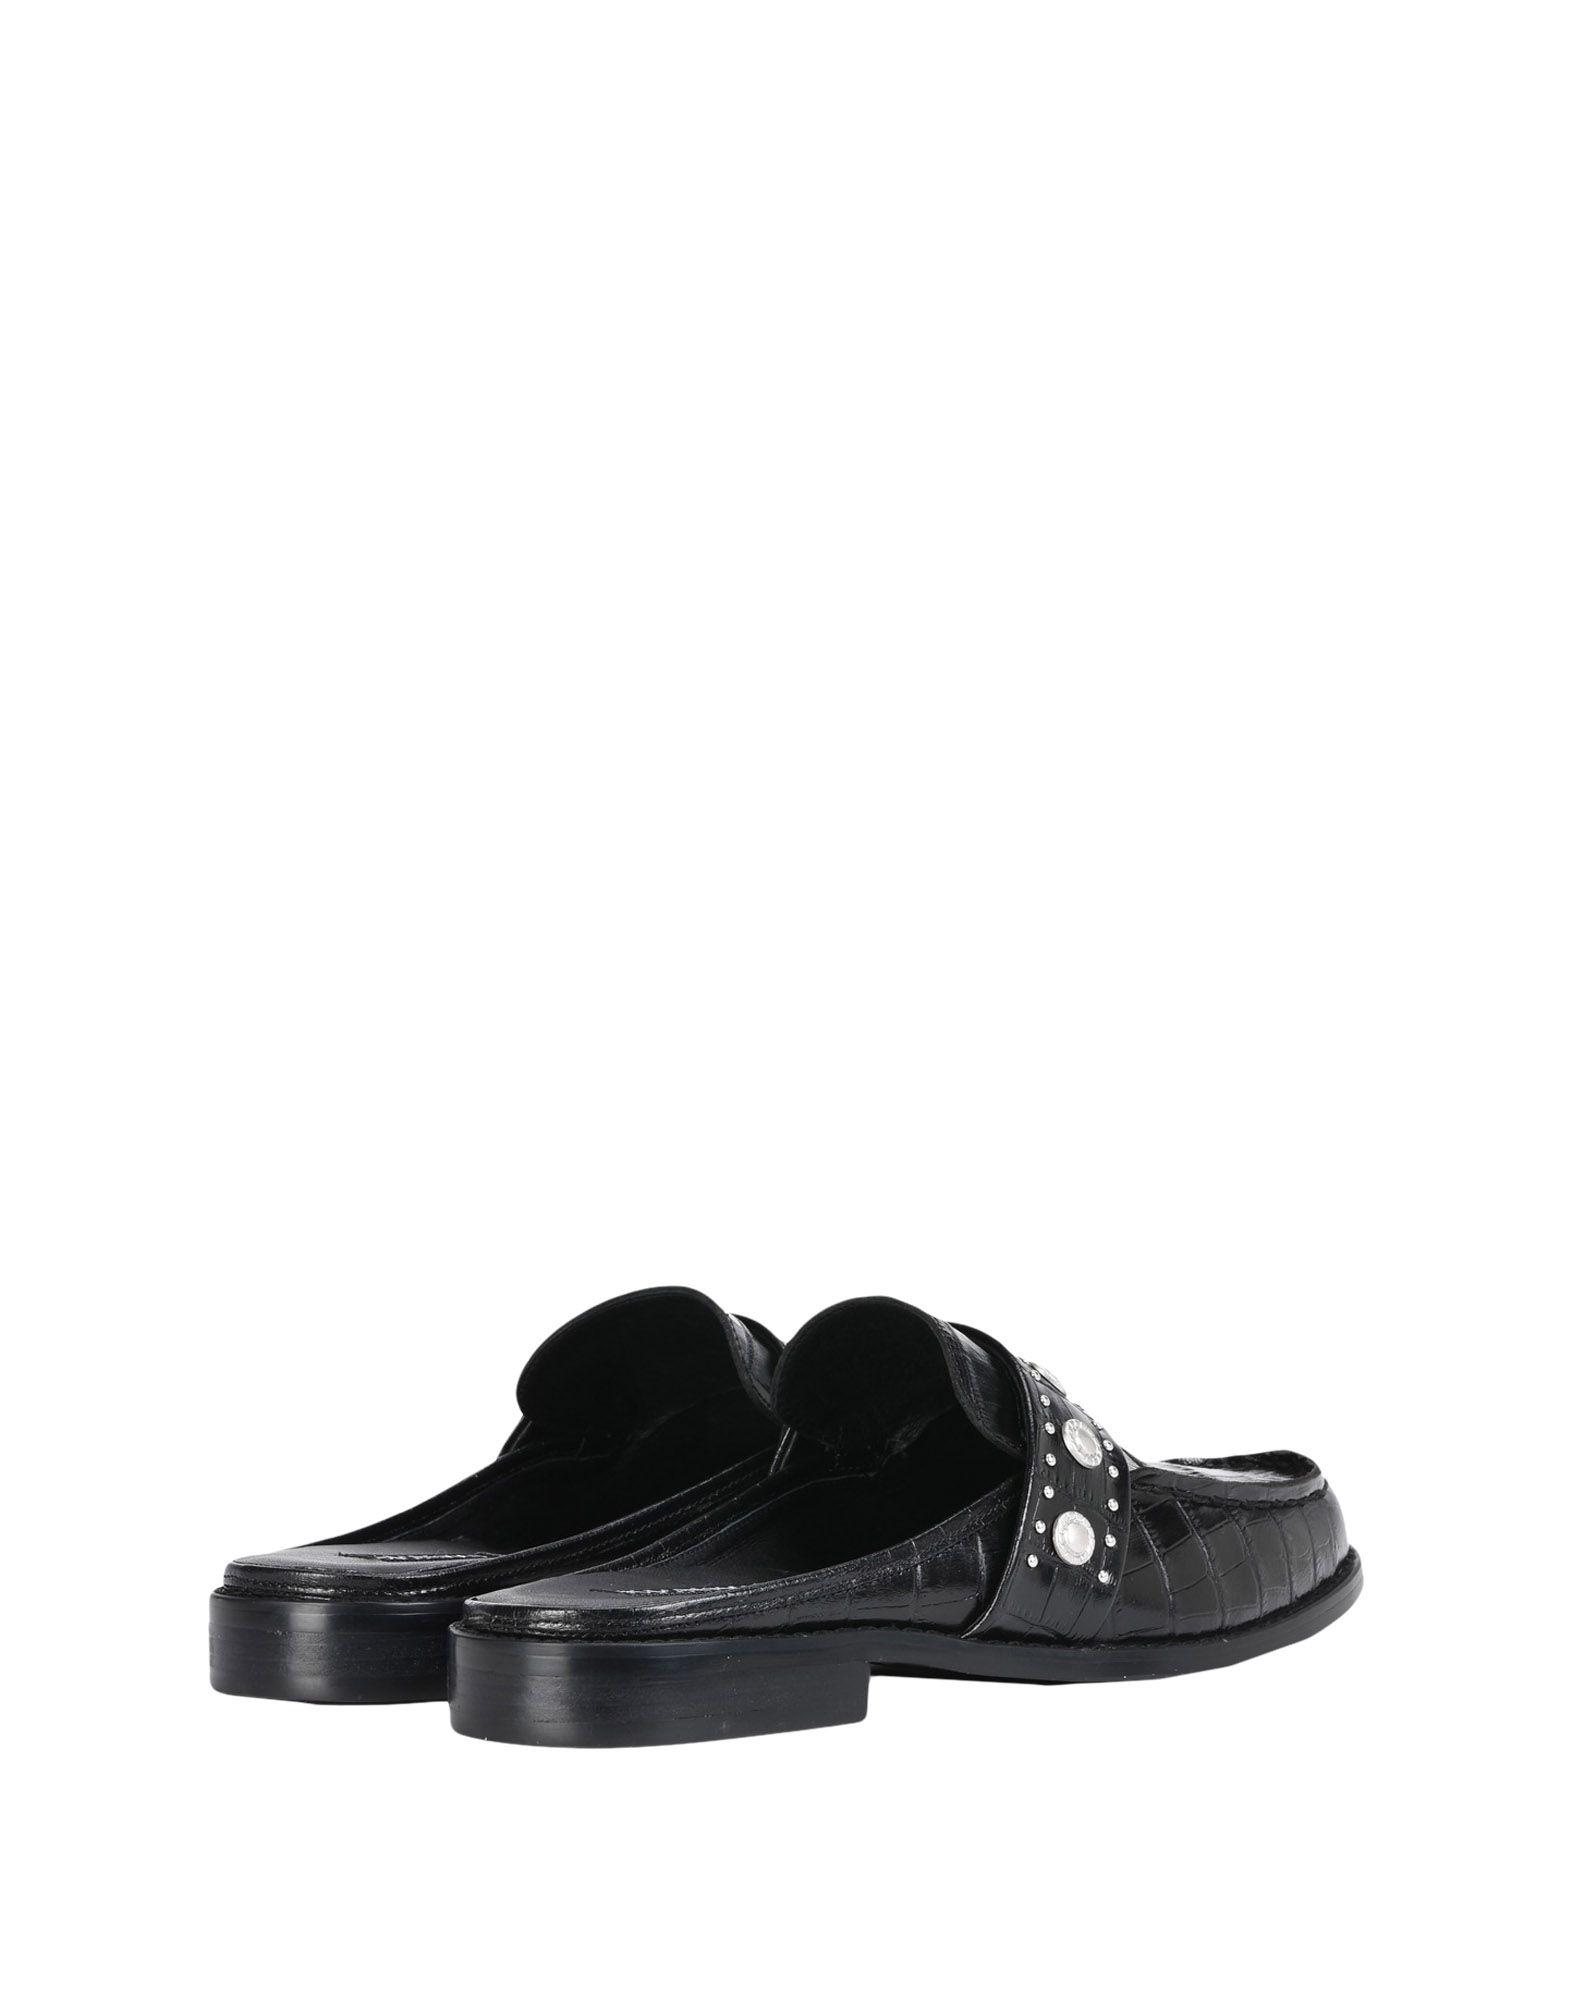 Stilvolle billige Schuhe Schuhe billige Senso Ciara 11457635TD c27e79